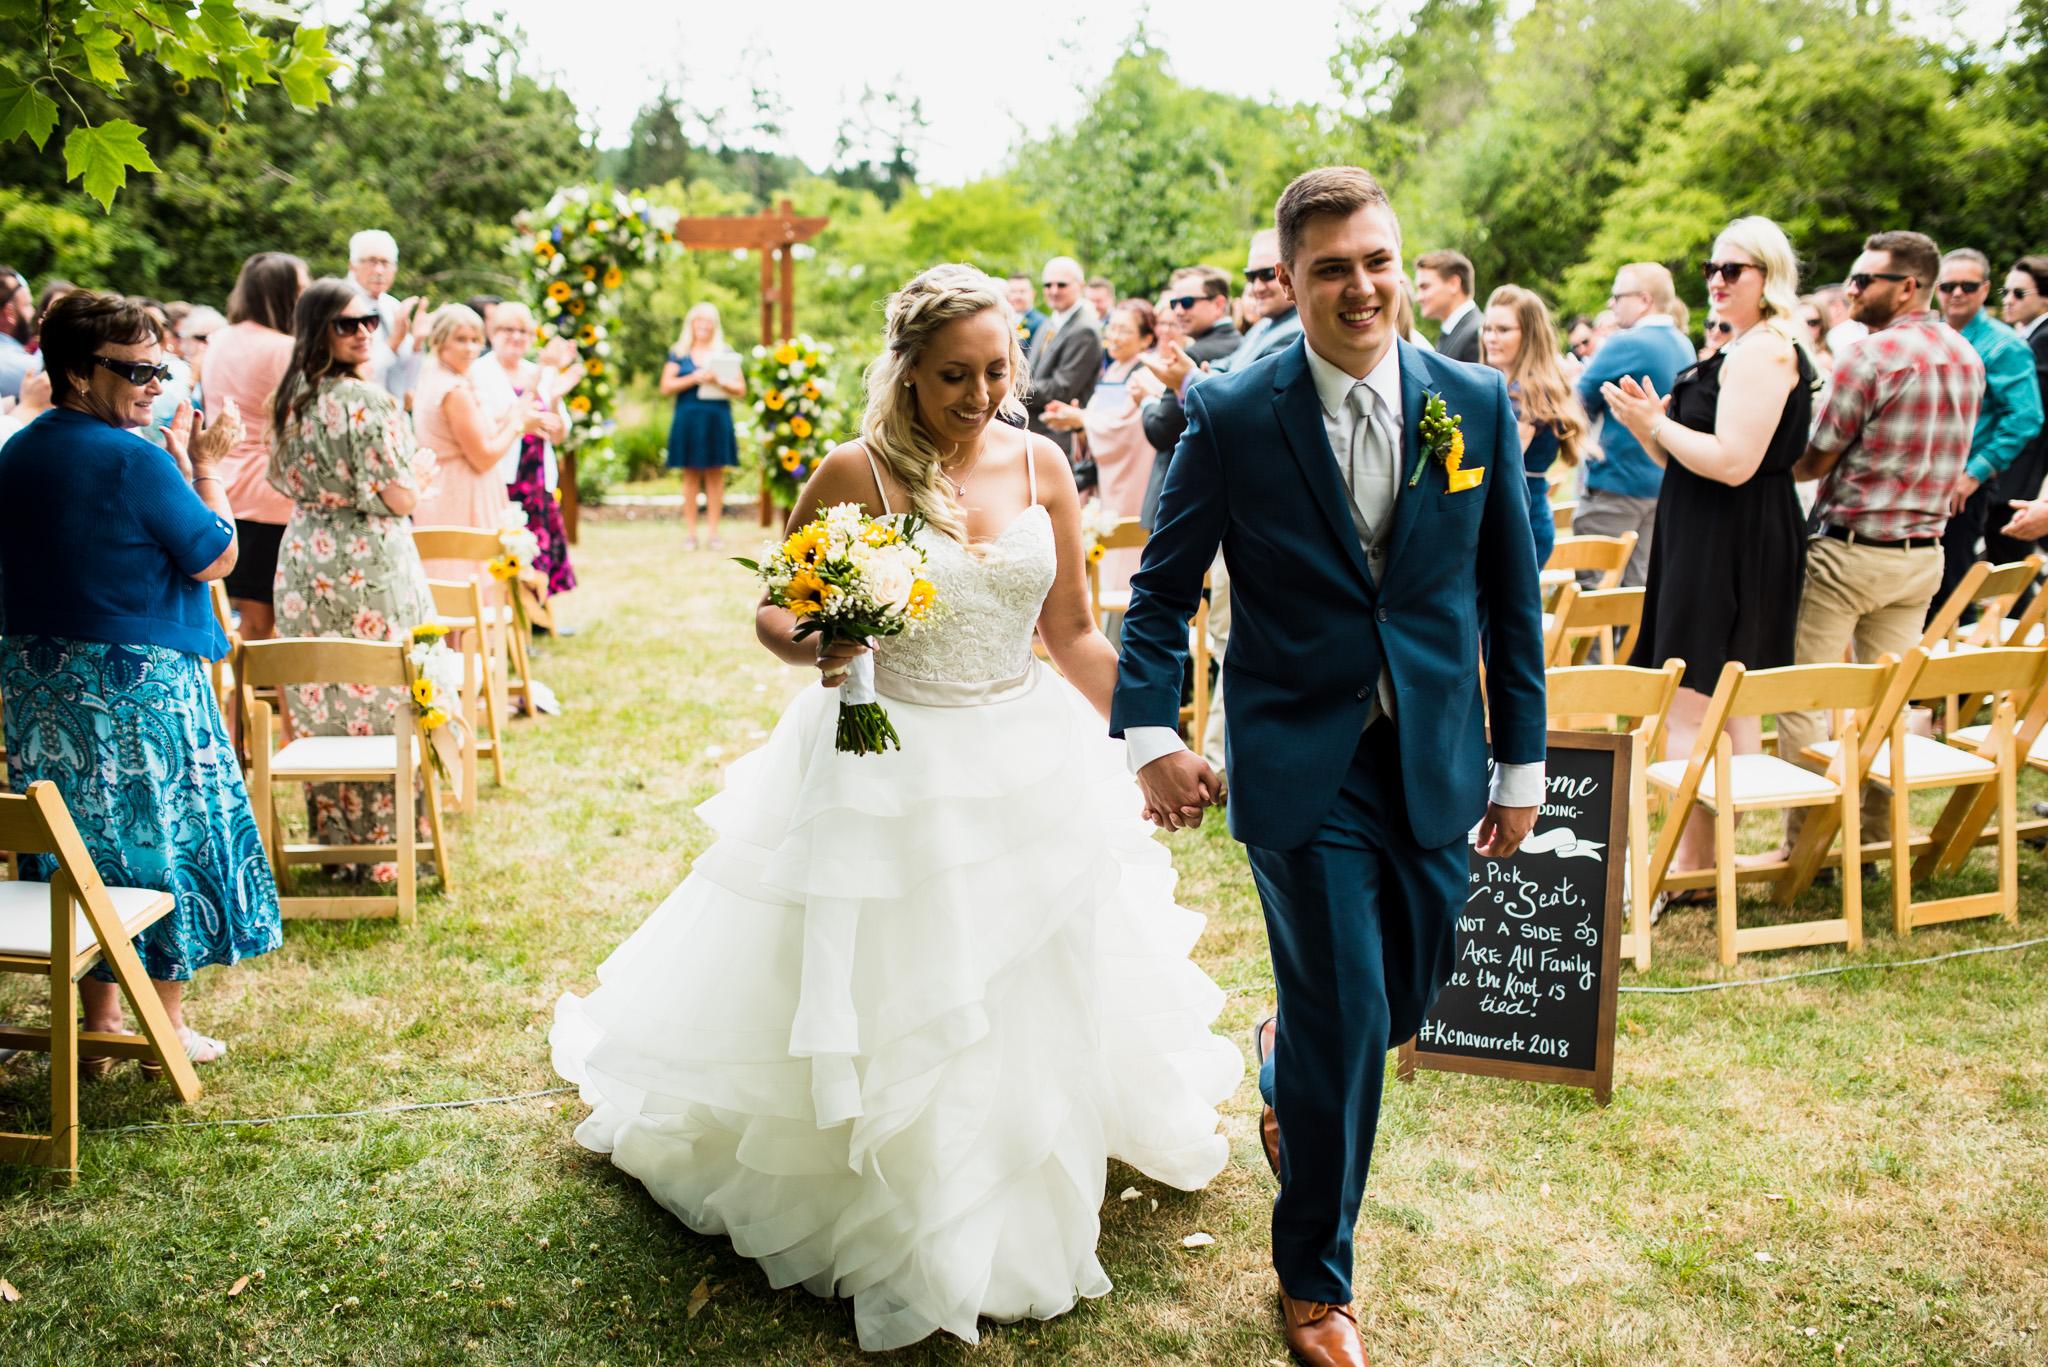 victoria-wedding-photographers-prospect-community-hall-wedding-33.jpg